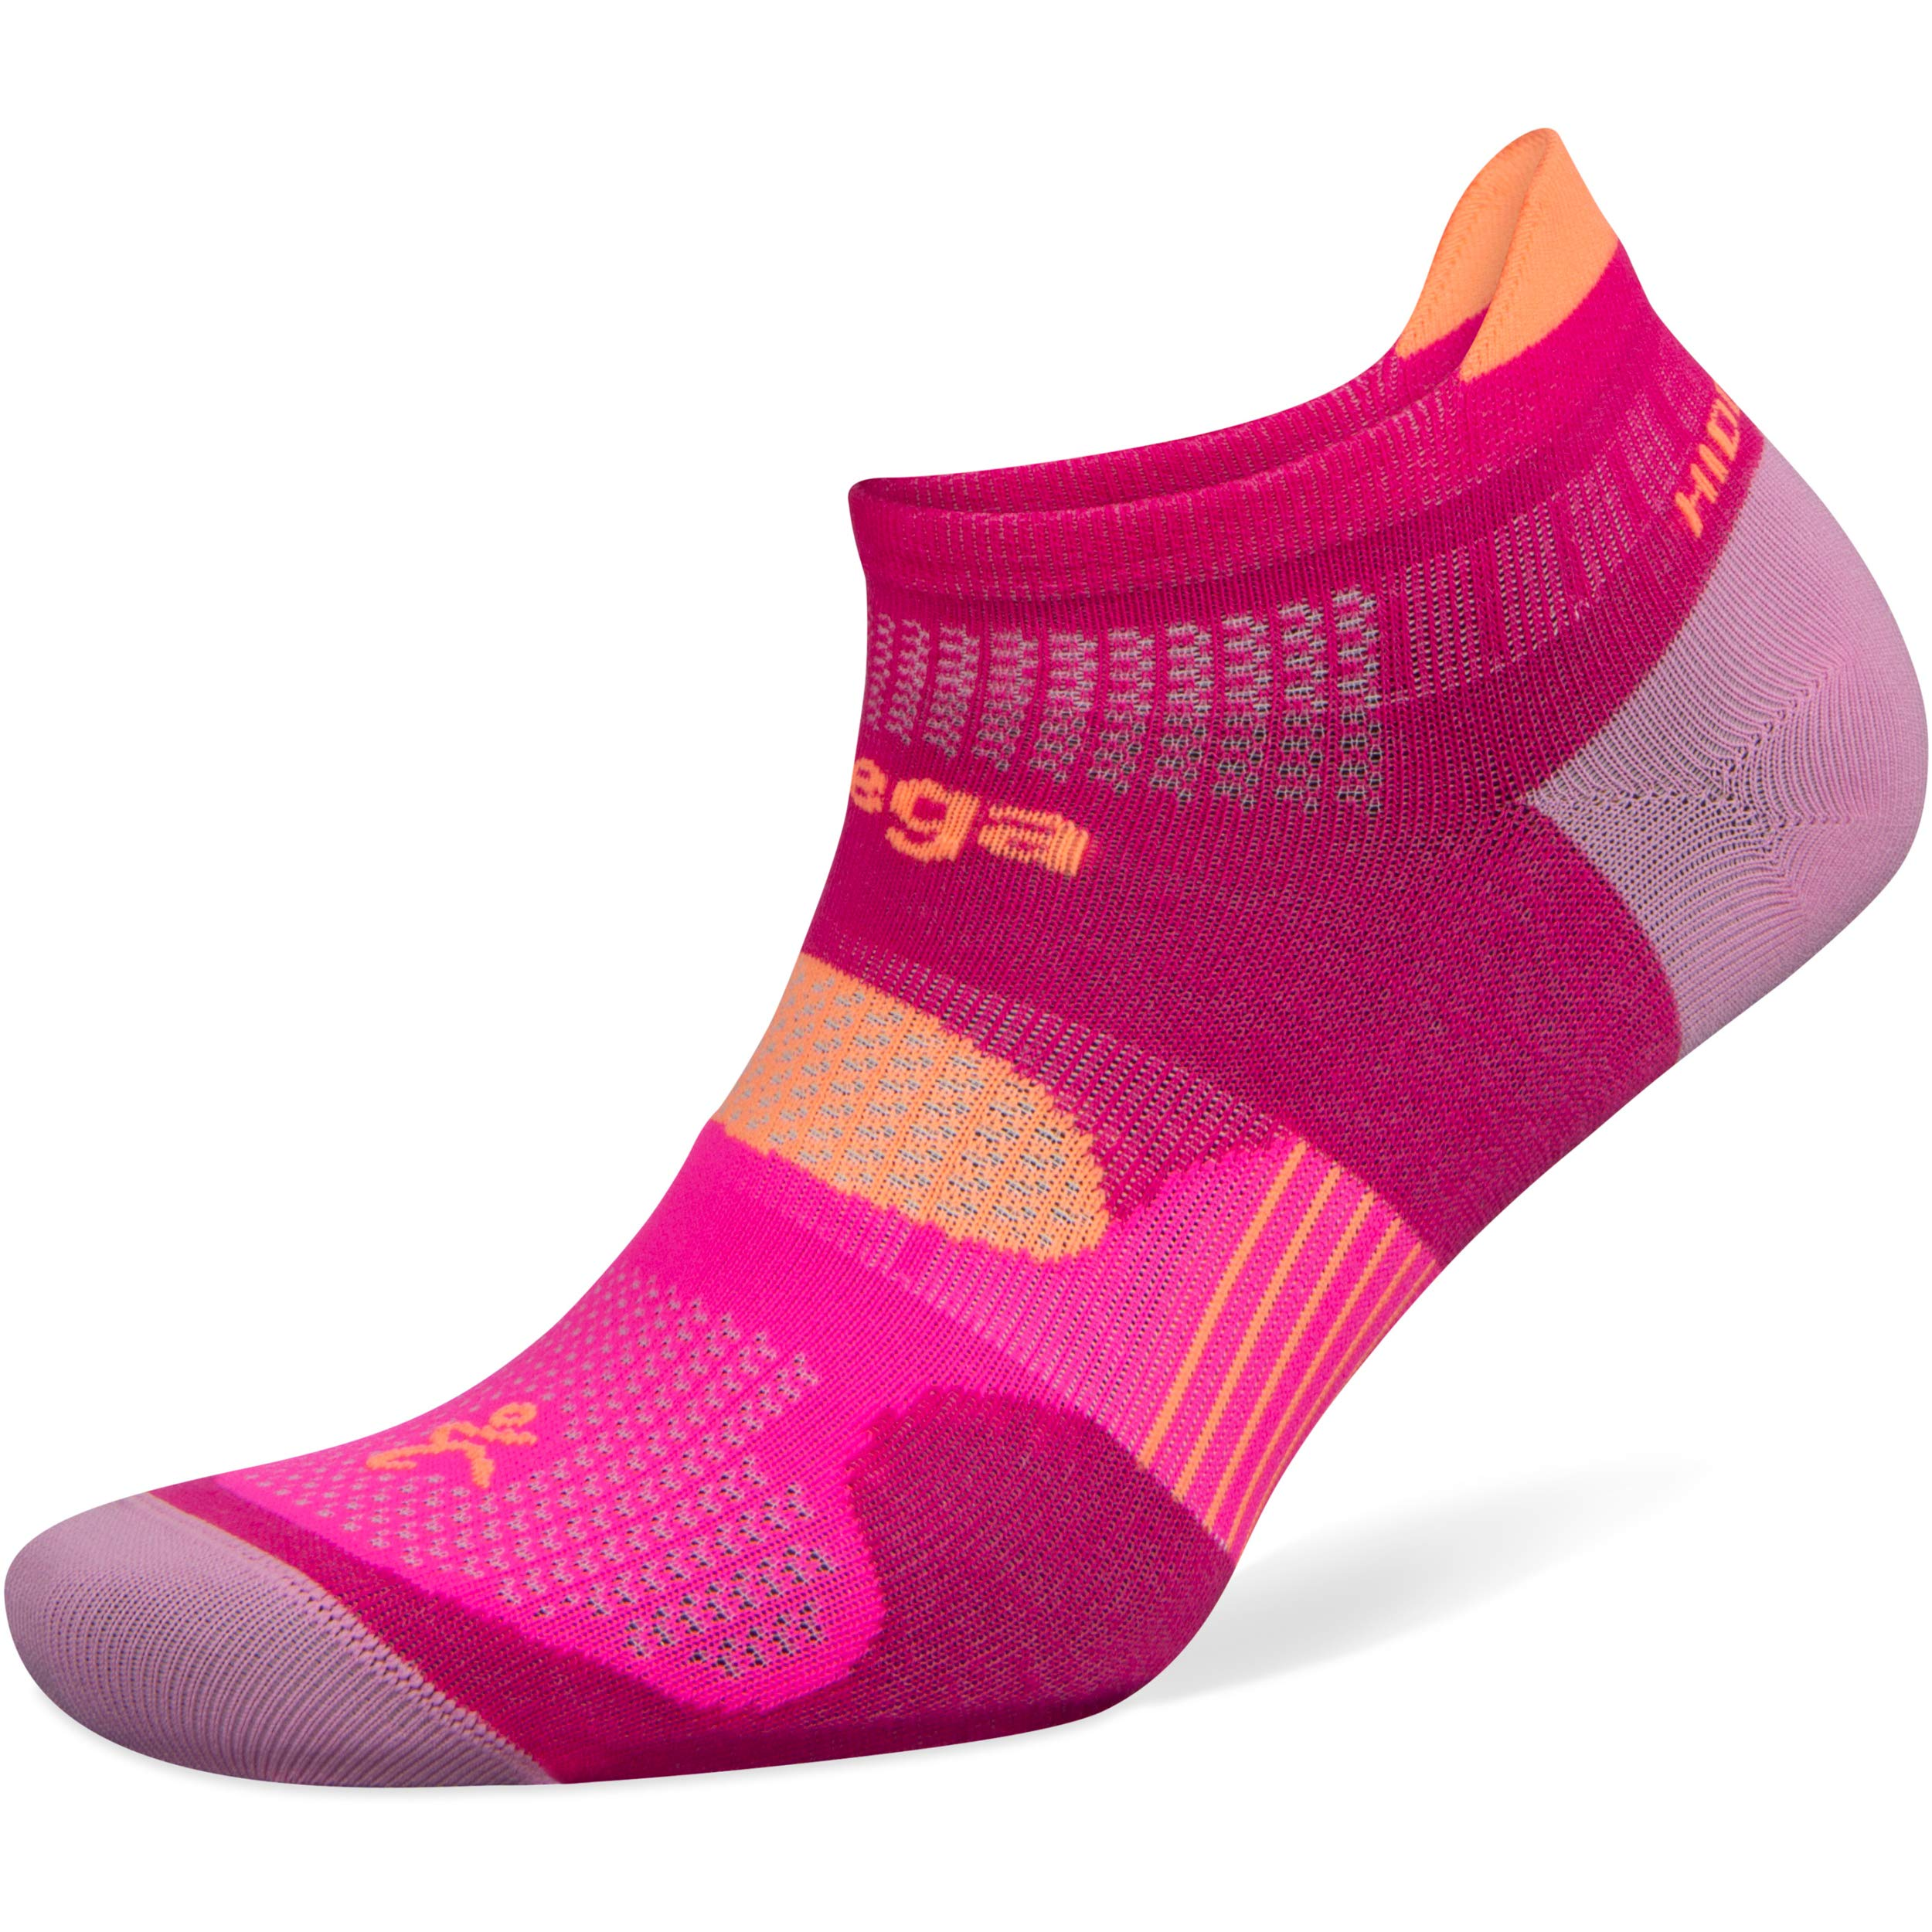 Balega Hidden Dry No Show Socks for Men and Women (1 Pair), Electric Pink/Bubblegum Pink, Large by Balega